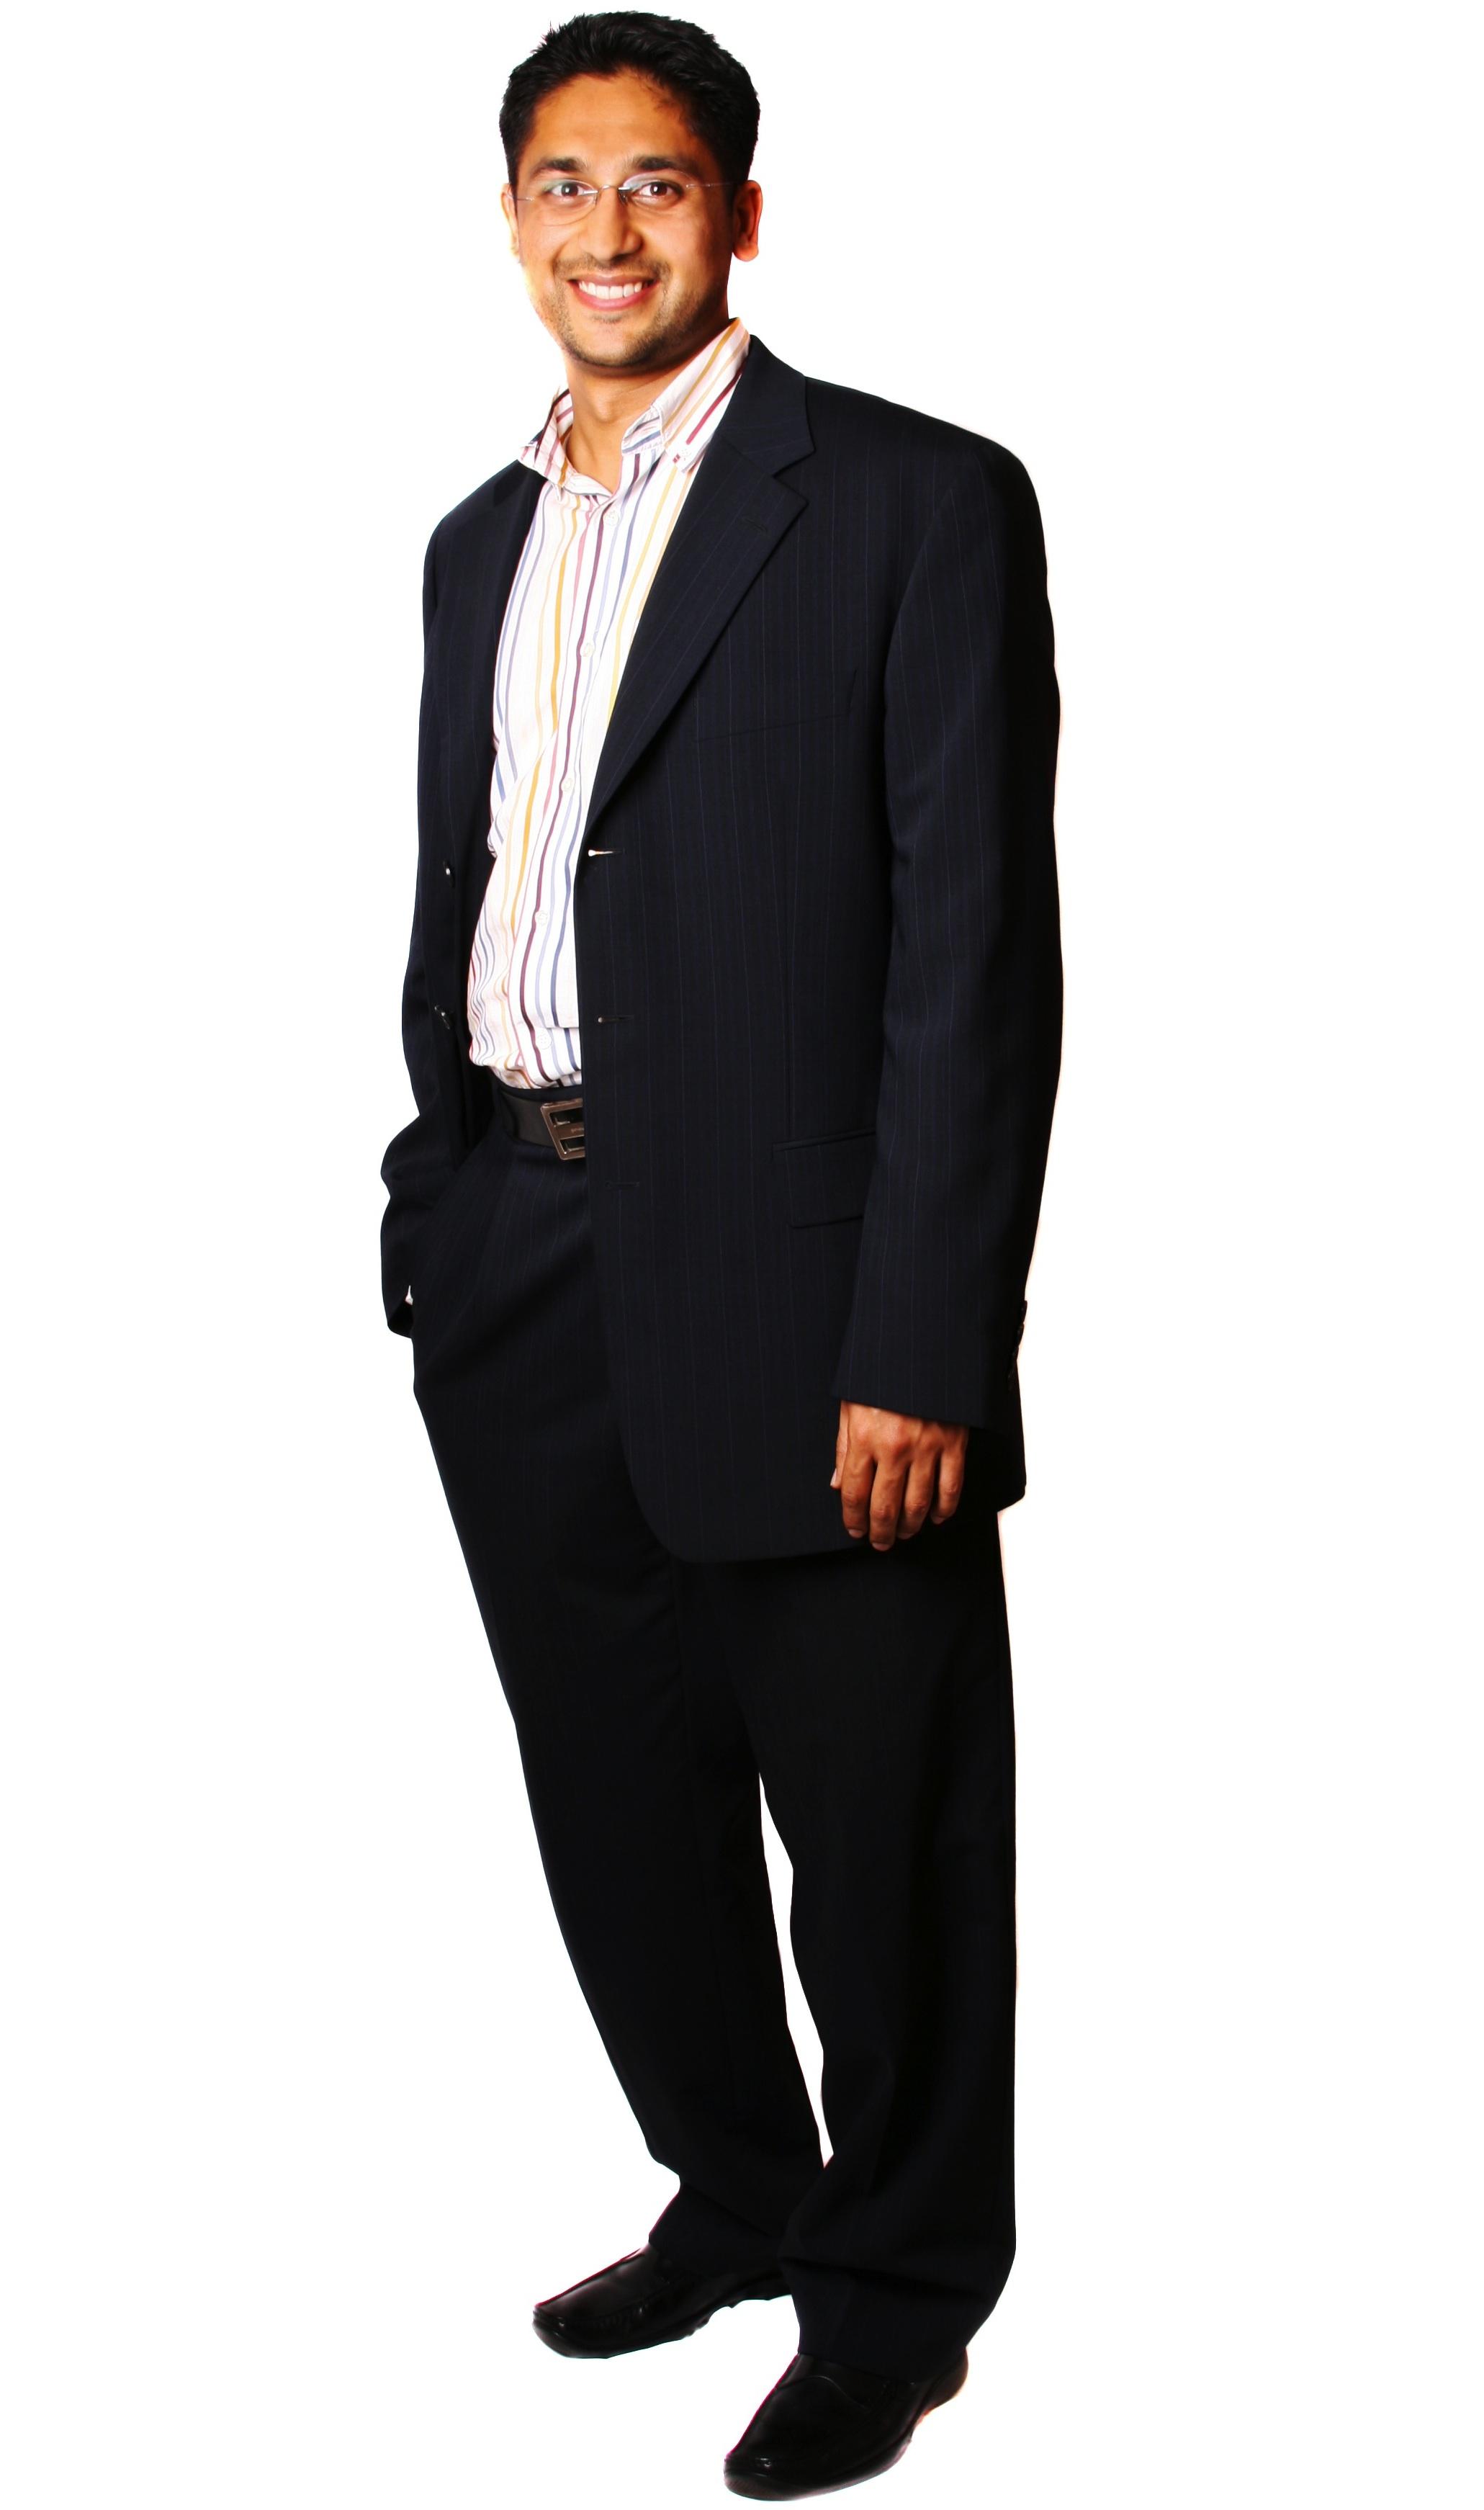 Muhammed Ismail